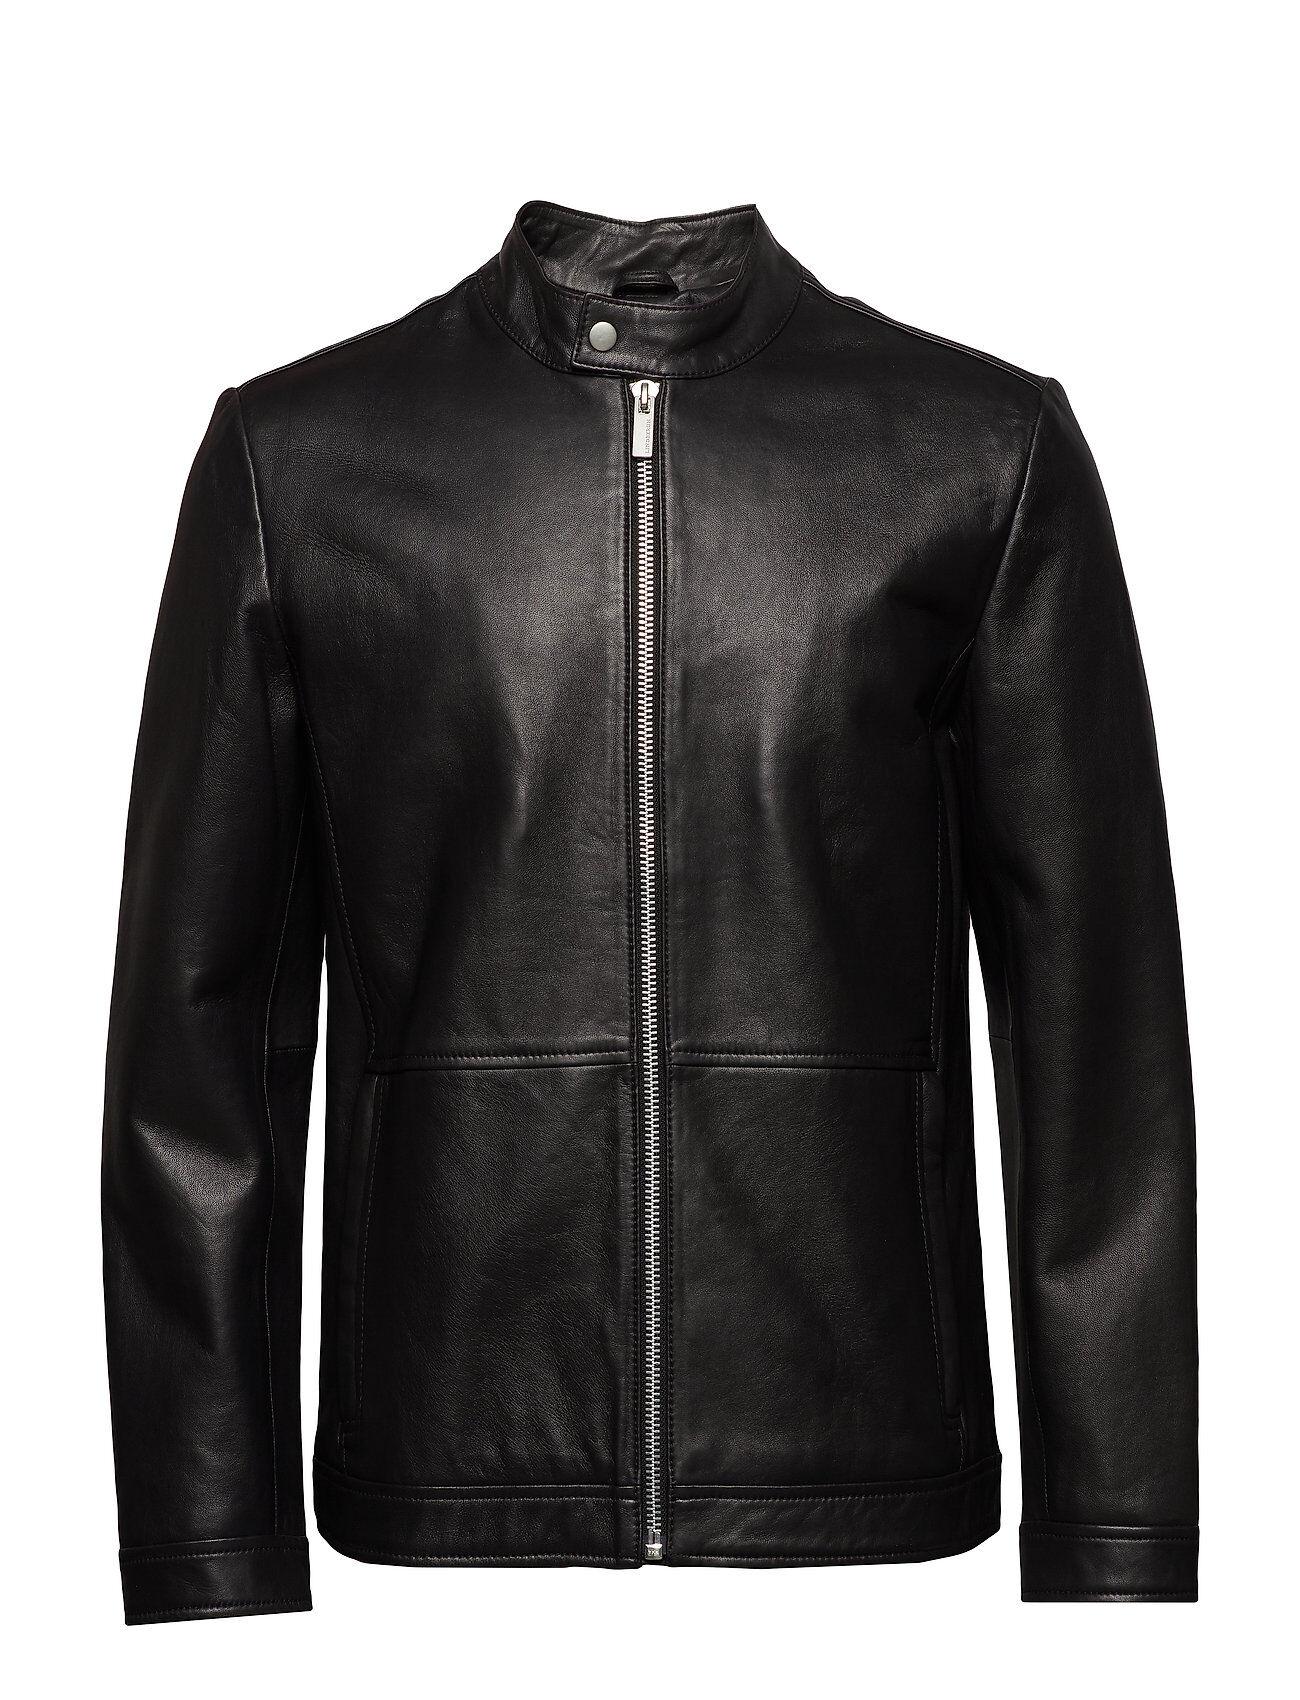 Lindbergh Bonded Leather Jacket